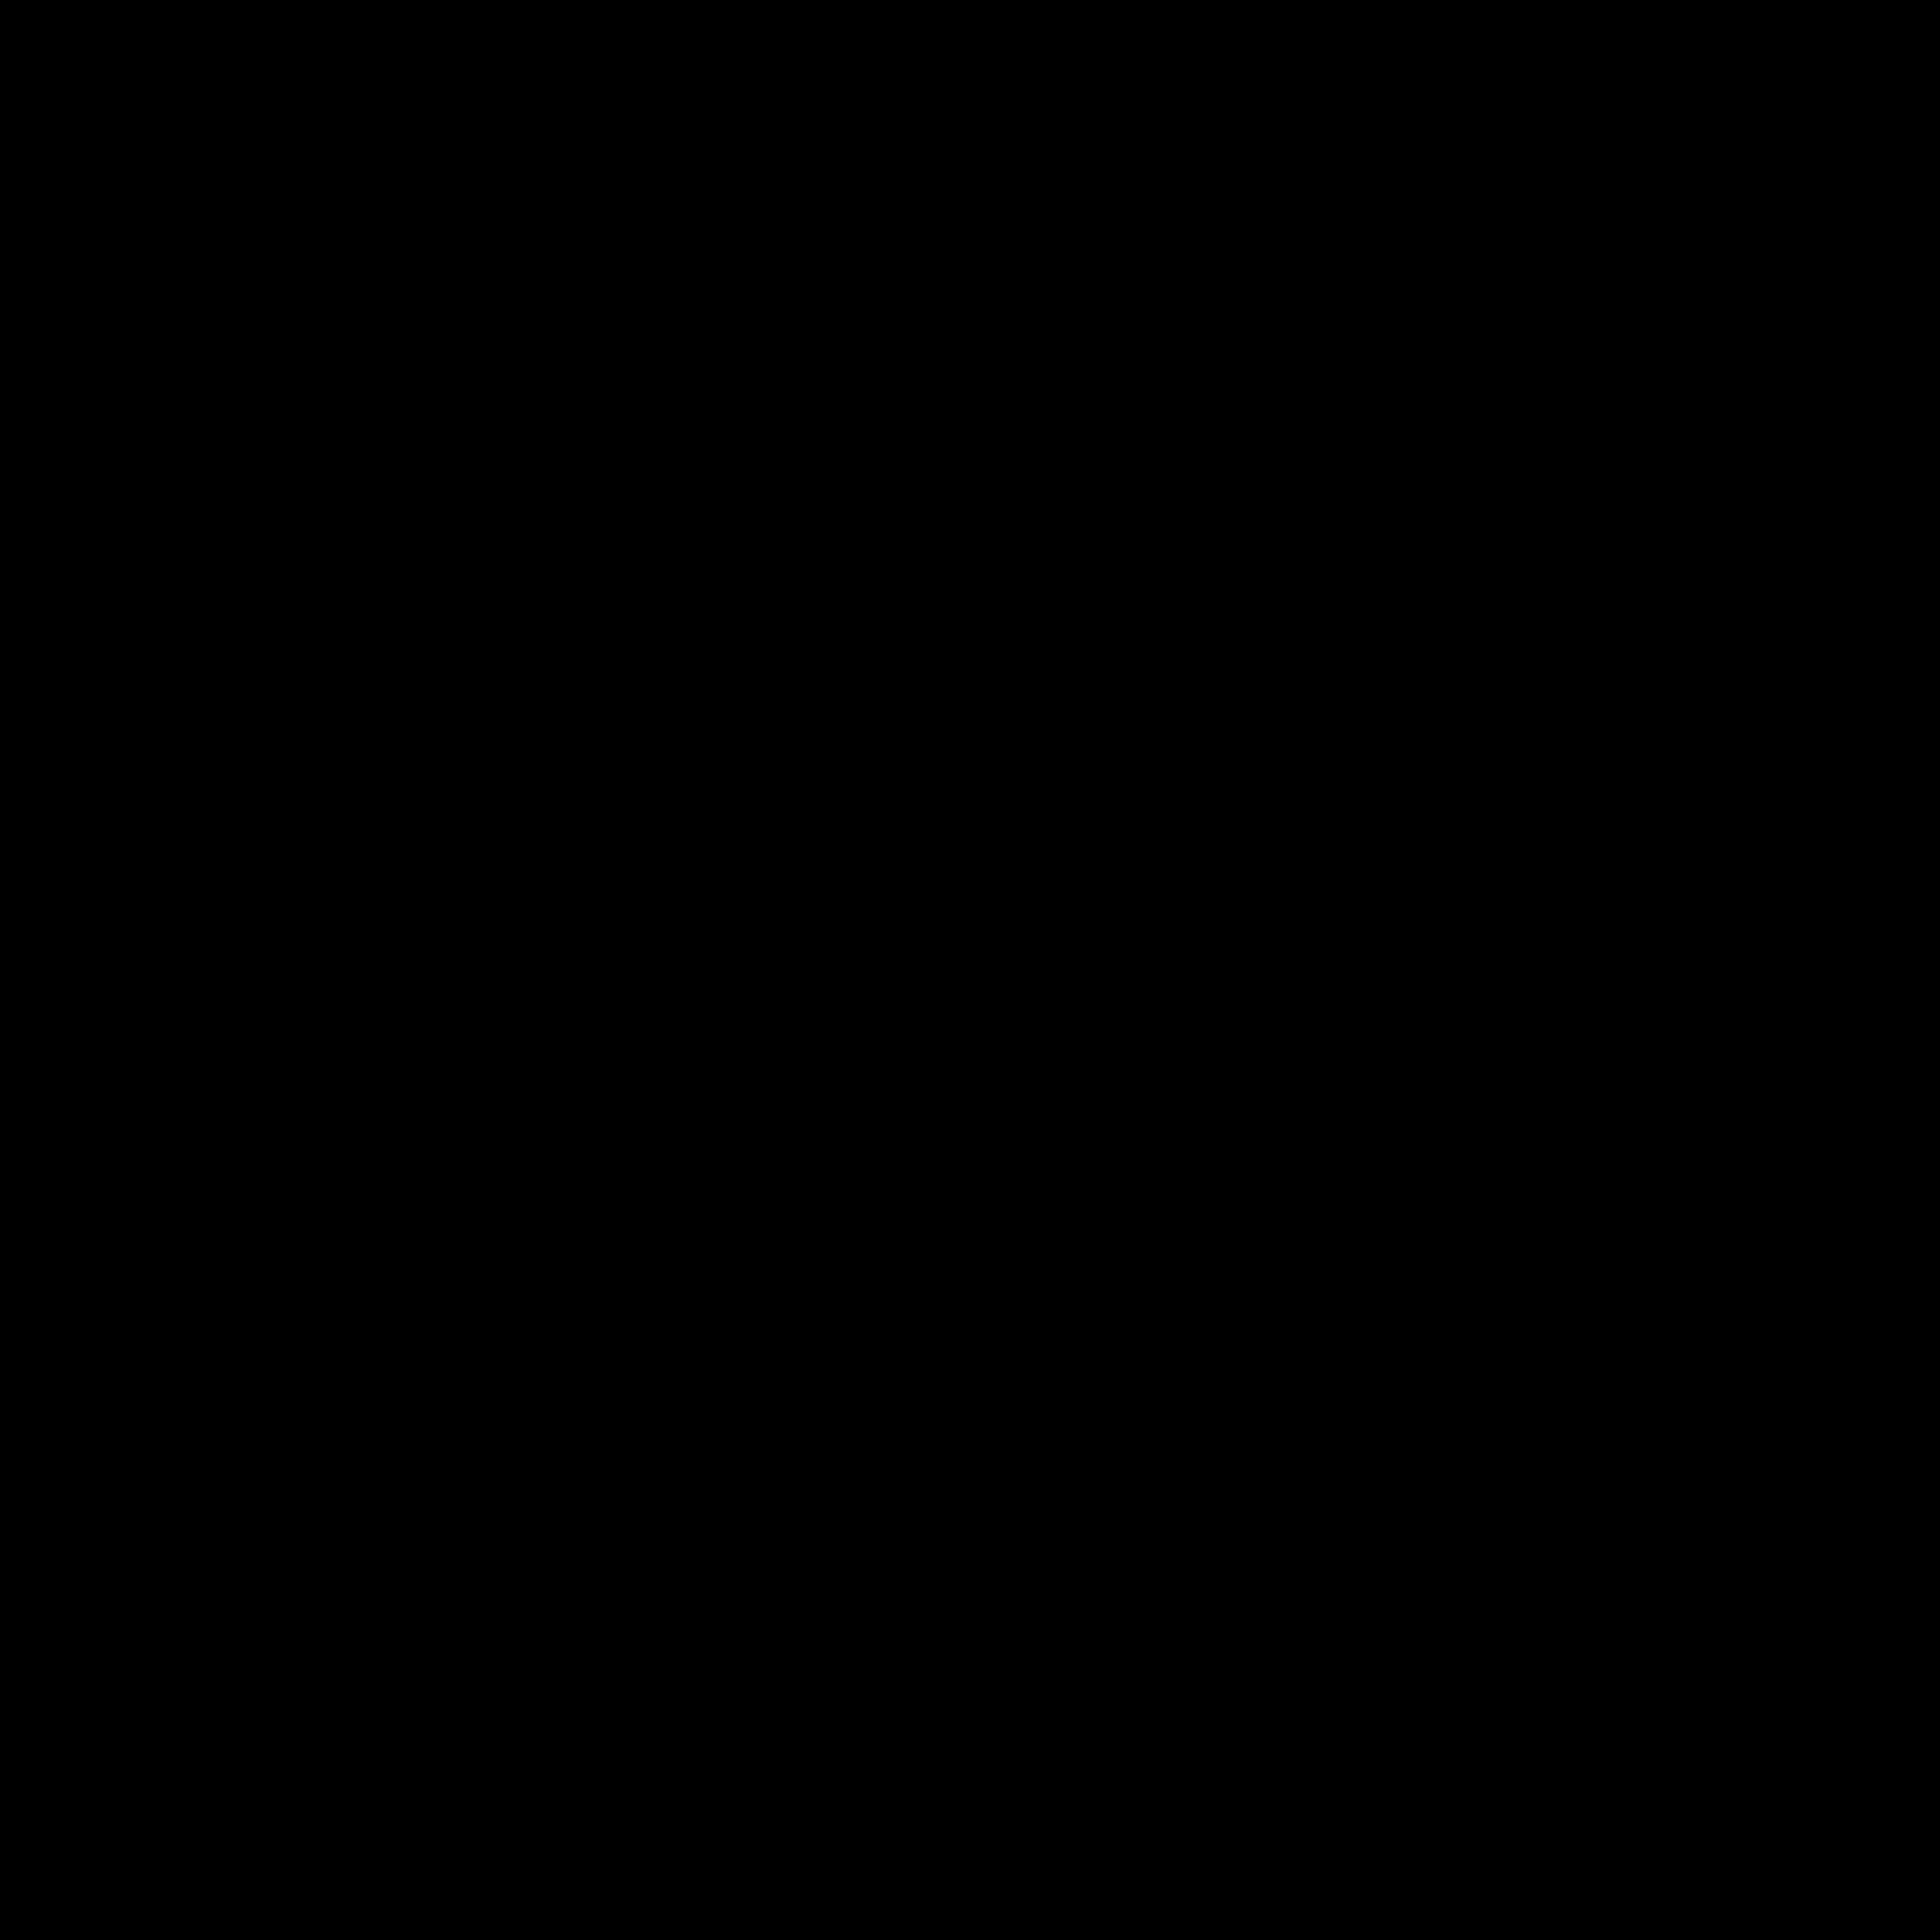 White clipart folder. File bimetrical icon black